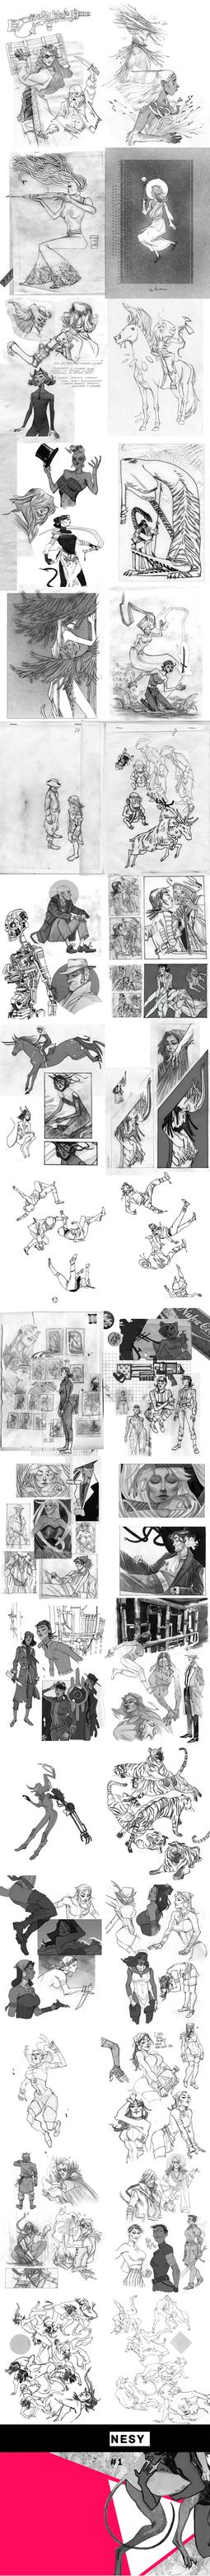 sketchbook #1 by Ne-sy